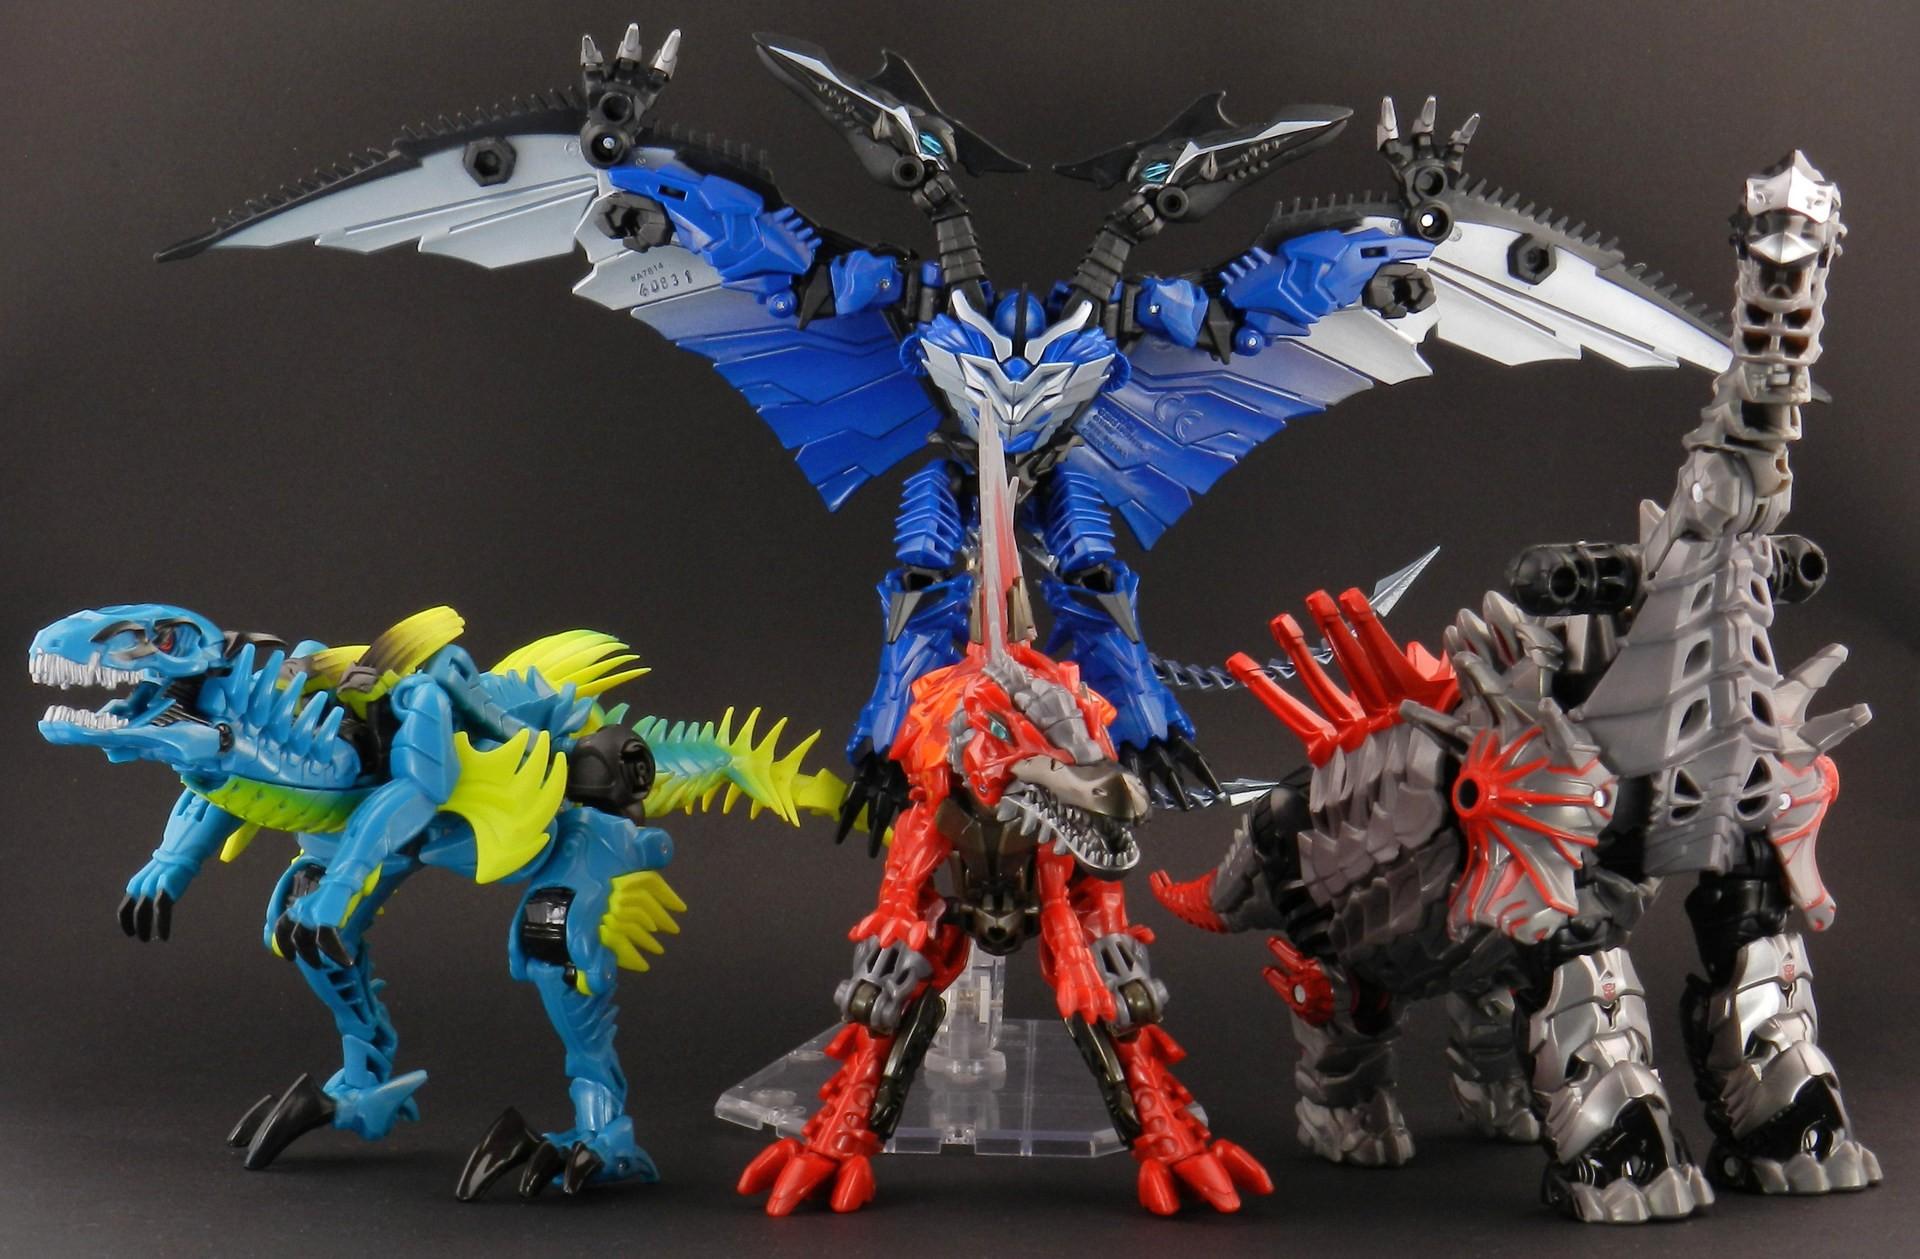 Slash-with-AoE-Dinobots-Dinosaurs